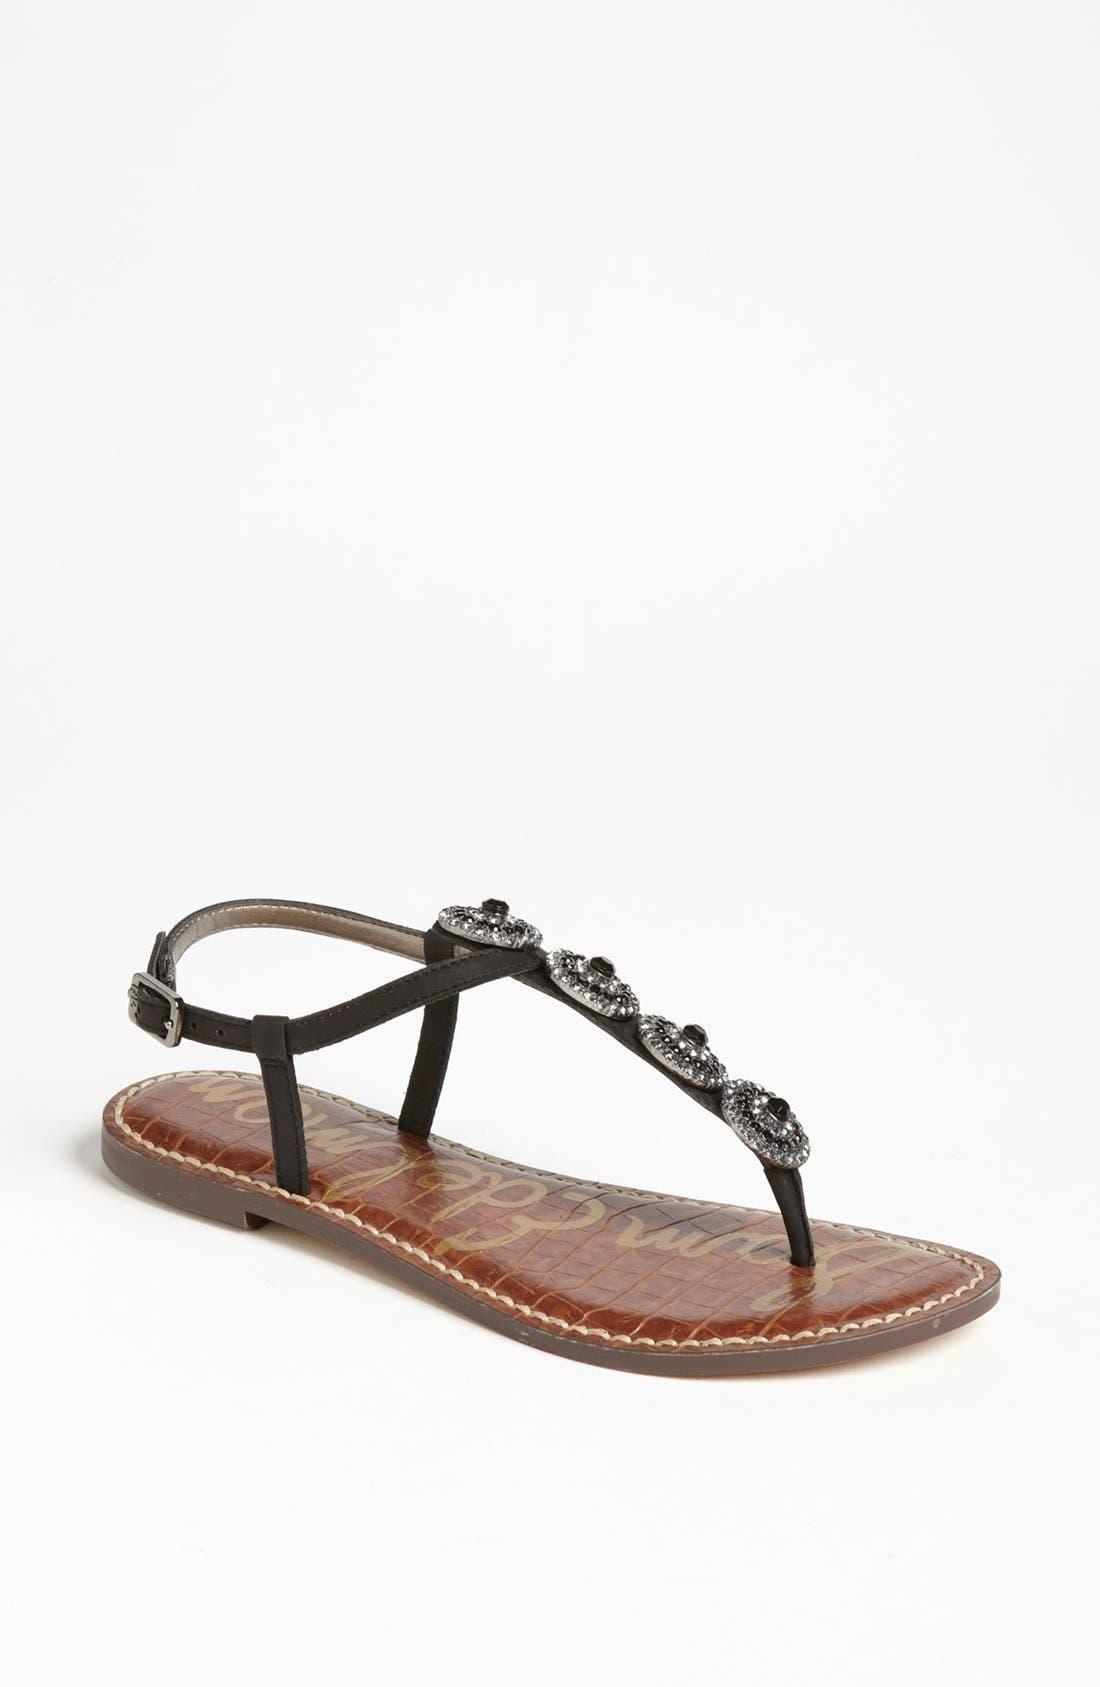 Alternate Image 1 Selected - Sam Edelman 'Galia' Sandal